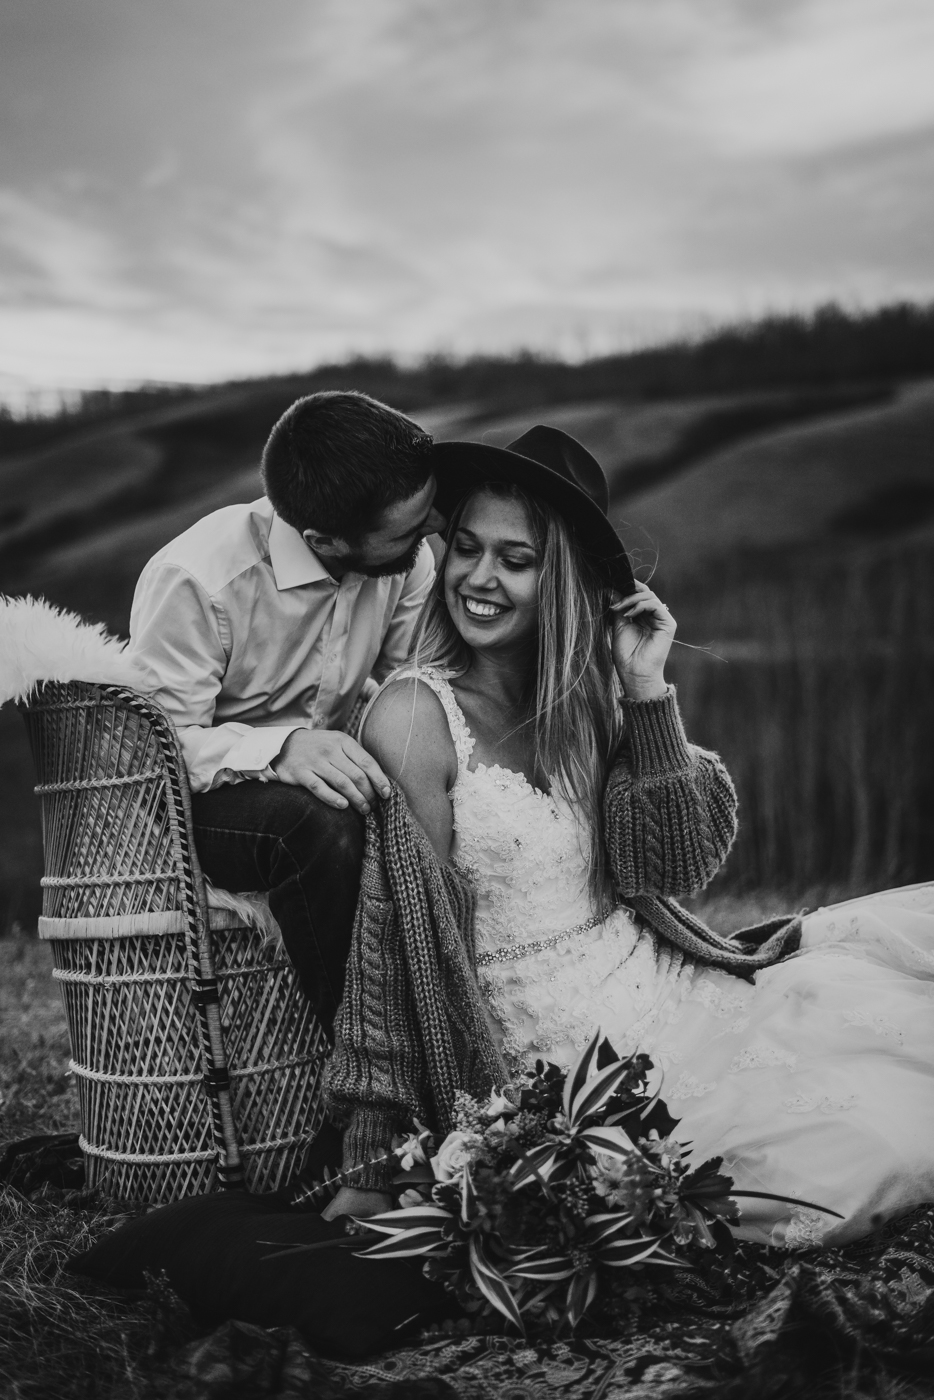 FortSt.John_photographer_TyraEPhotography_Wedding_Couple_Family_Photograhy_DawsonCreek_Elopement_Bride_Boduoir_Portraits-4.jpg